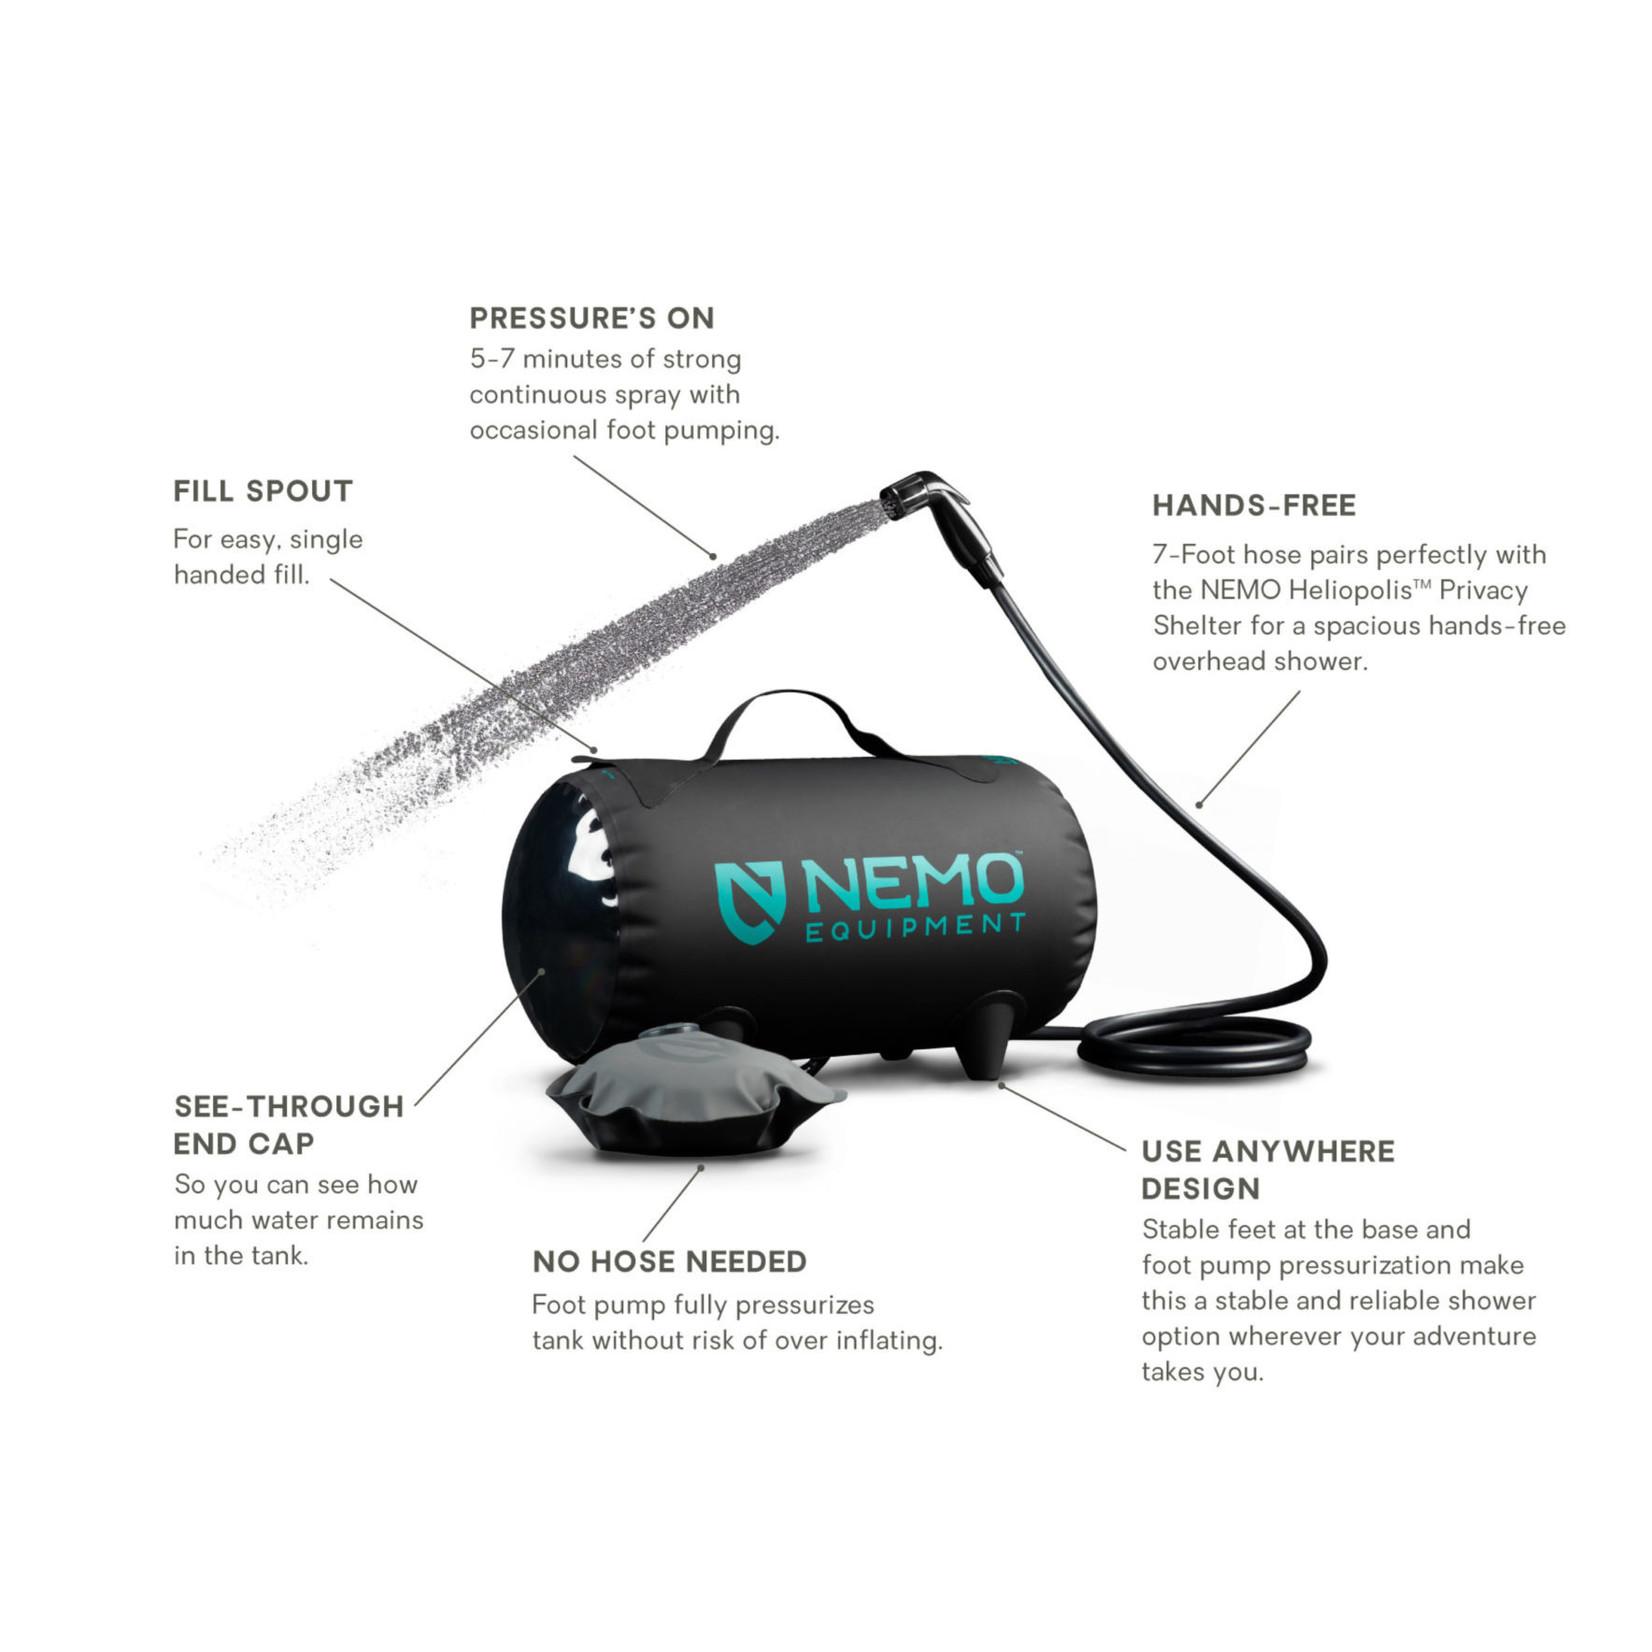 NEMO Helio™ Pressure Shower